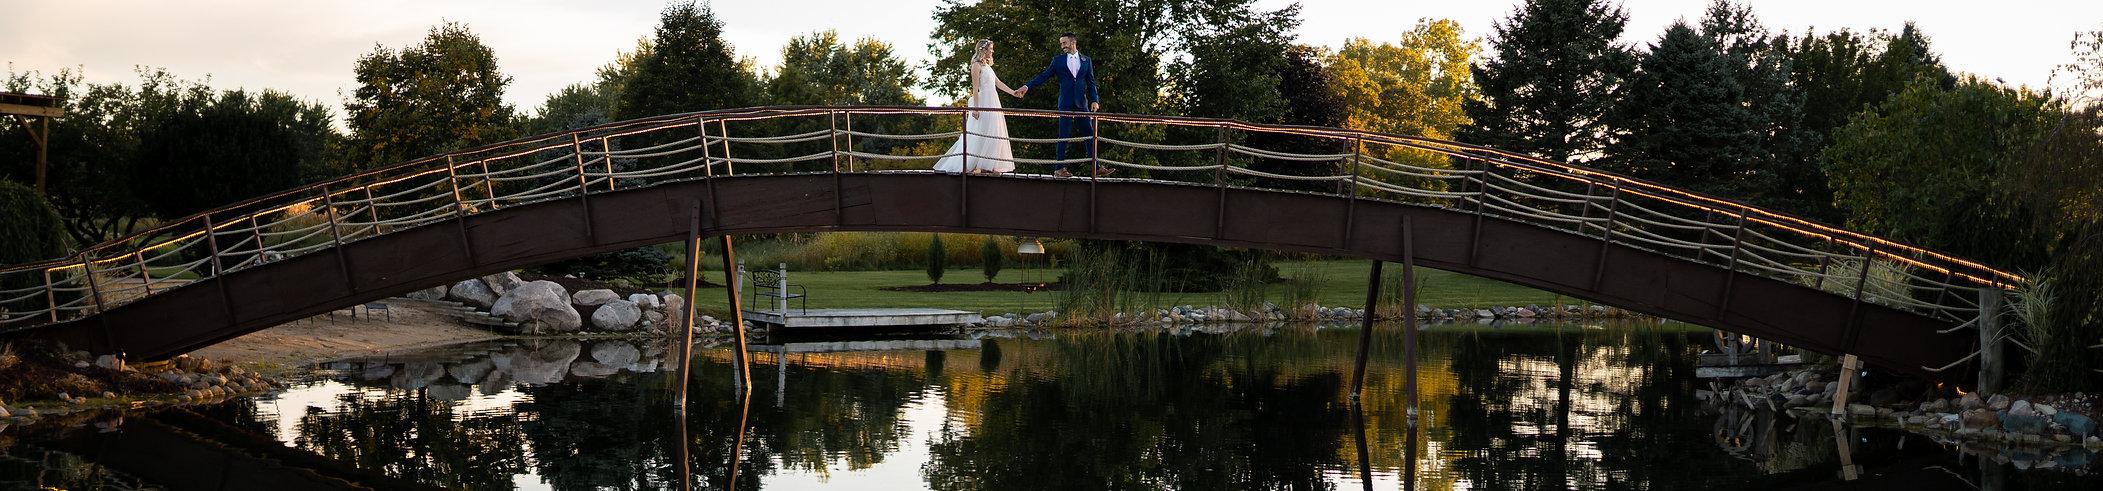 Alisha and Brent Wedding color-391.jpg